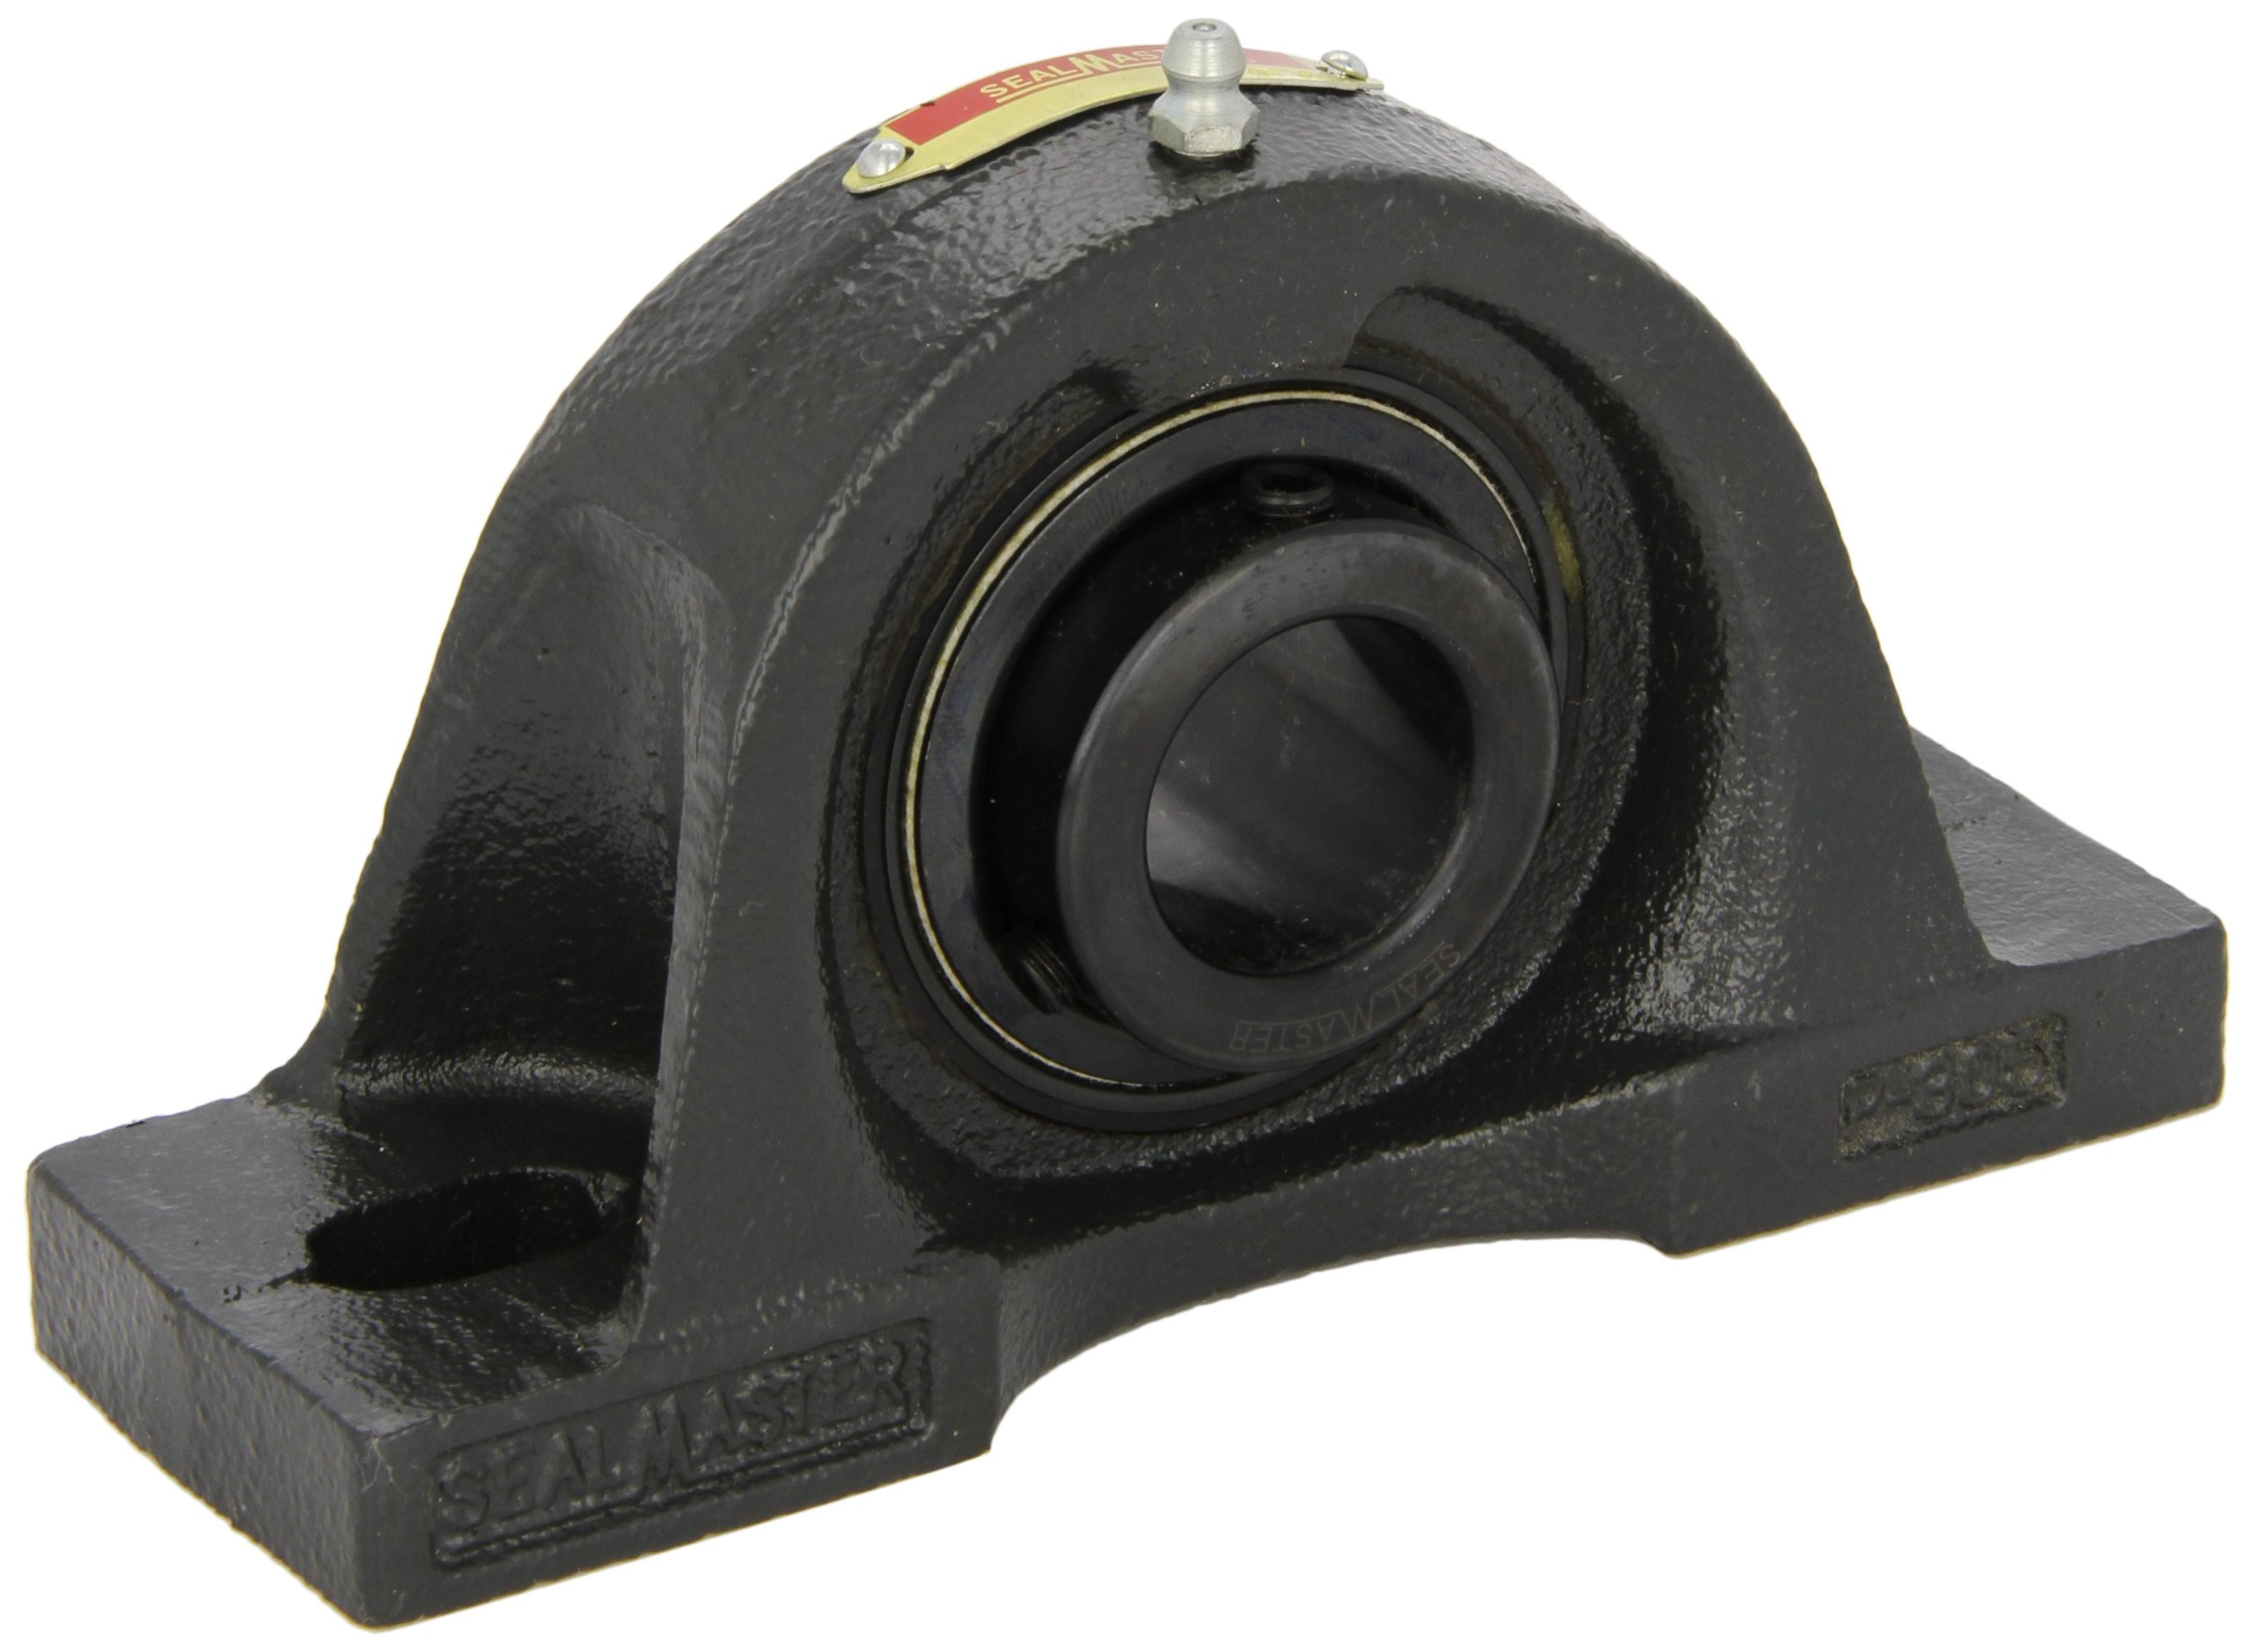 "Sealmaster MP-47 Pillow Block Ball Bearing, Non-Expansion Type, Medium-Duty, Regreasable, Setscrew Locking Collar, Felt Seals, Cast Iron Housing, 2-15/16"" Bore, 3-1/2"" Base to Center Height, 9"" Bolt Hole Spacing Width, ±2 degrees Misalignment Angle"